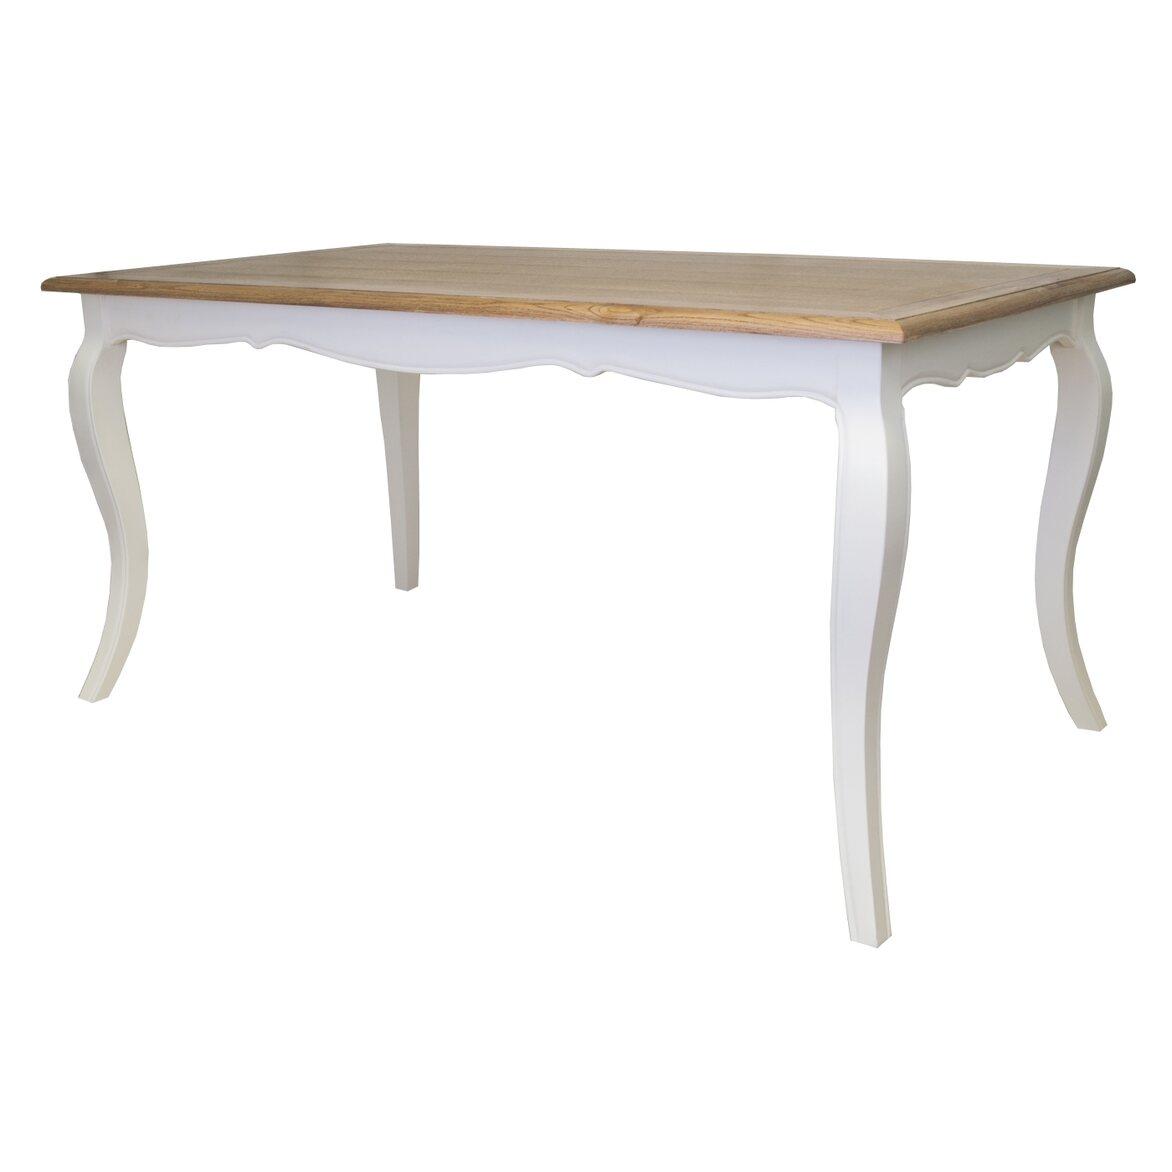 Обеденный стол Tulin 2 | Обеденные столы Kingsby